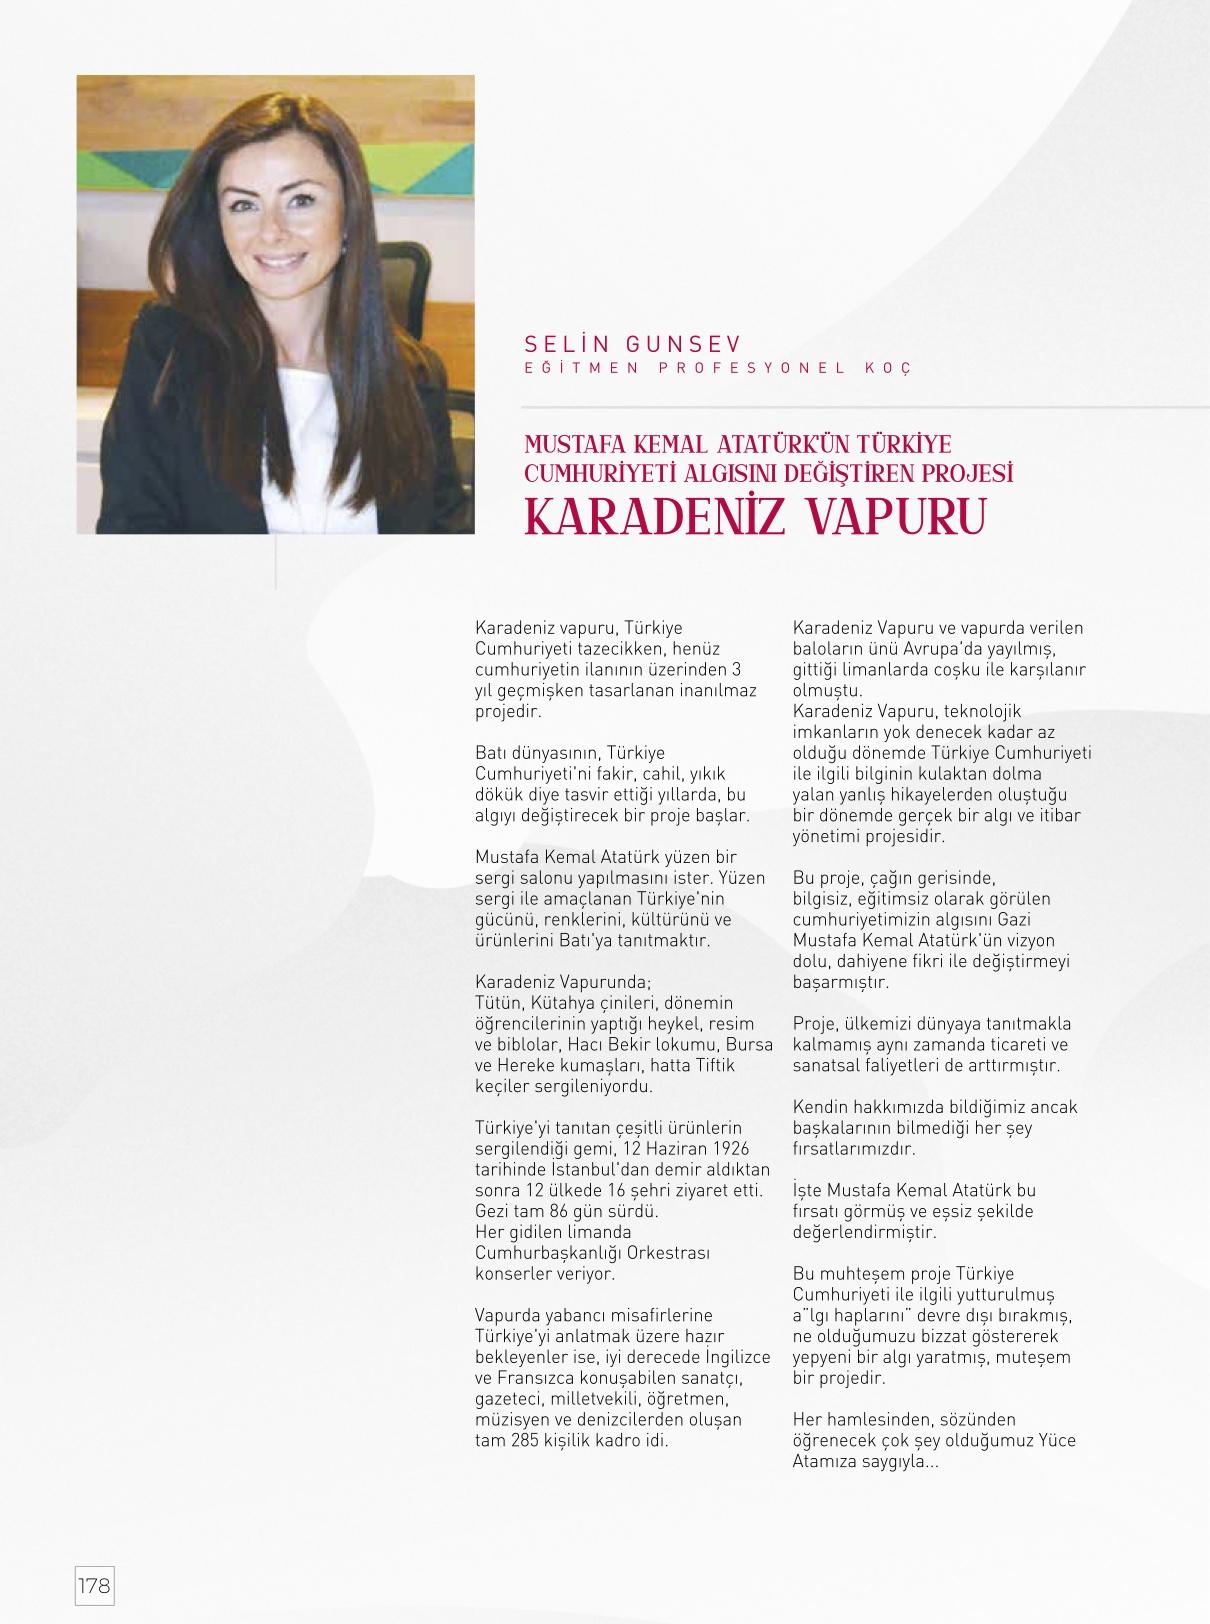 karadeniz_vapuru